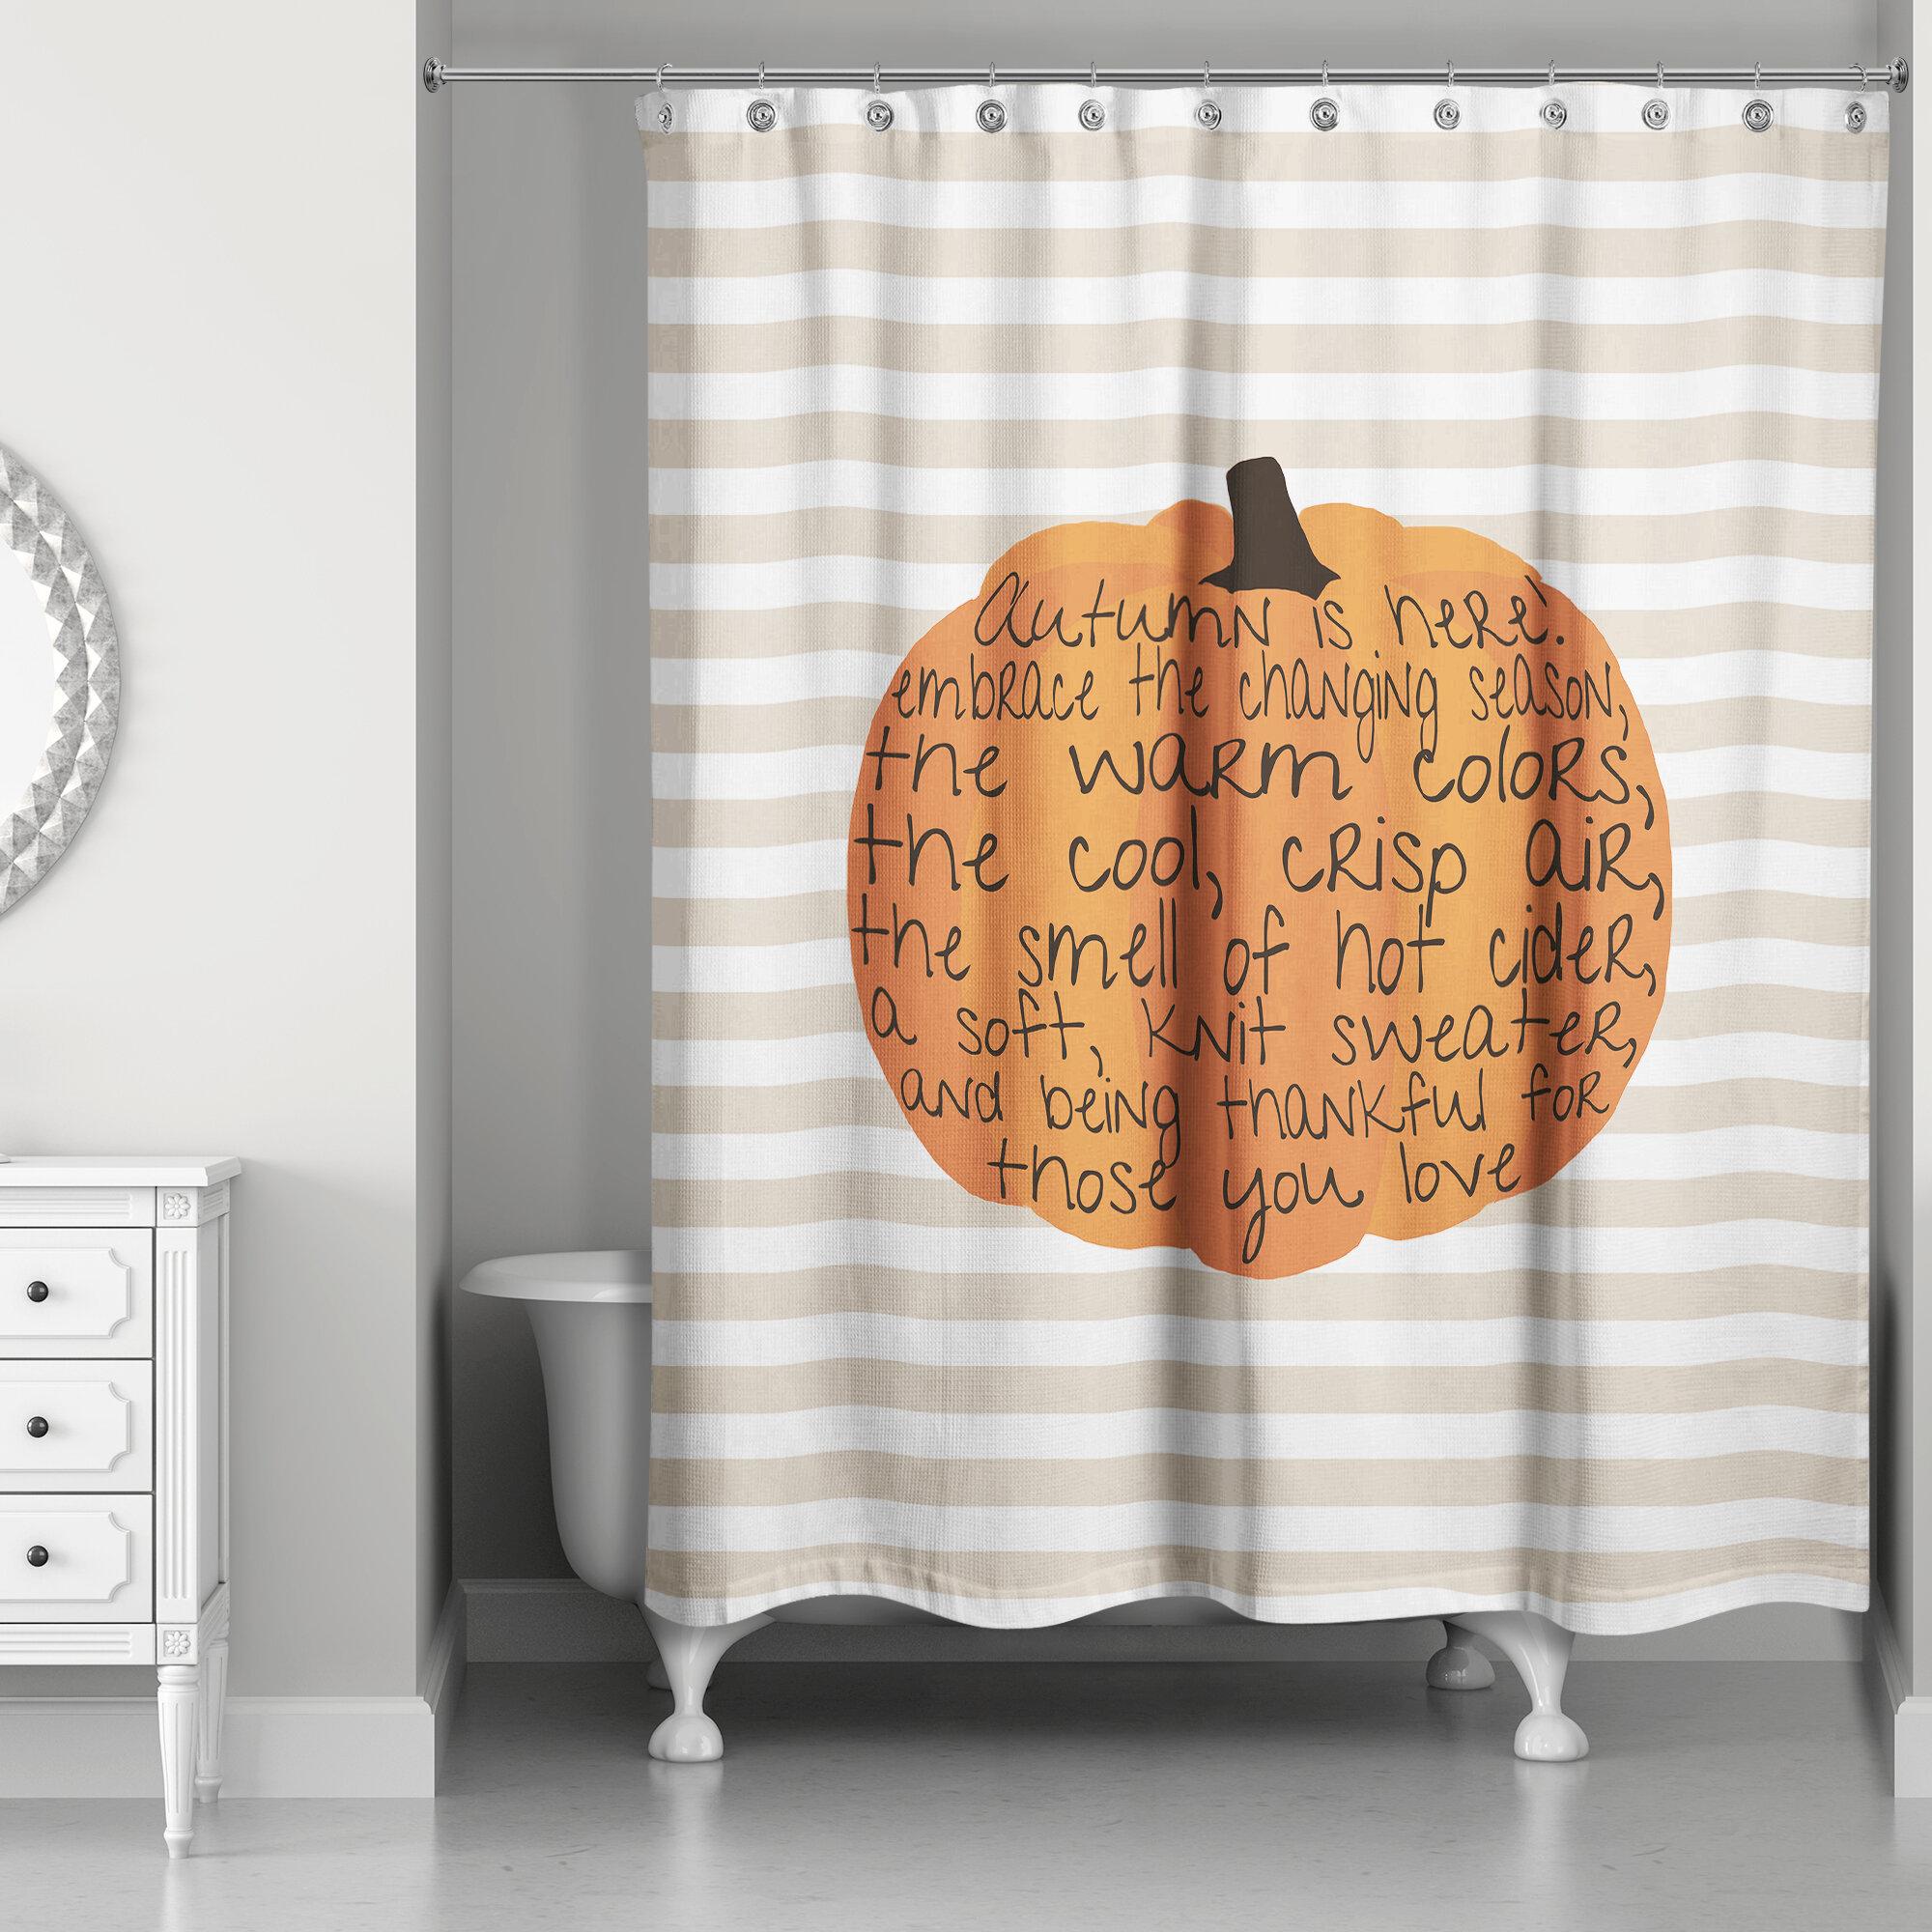 High Quality The Holiday Aisle Embrace Autumn Shower Curtain U0026 Reviews | Wayfair